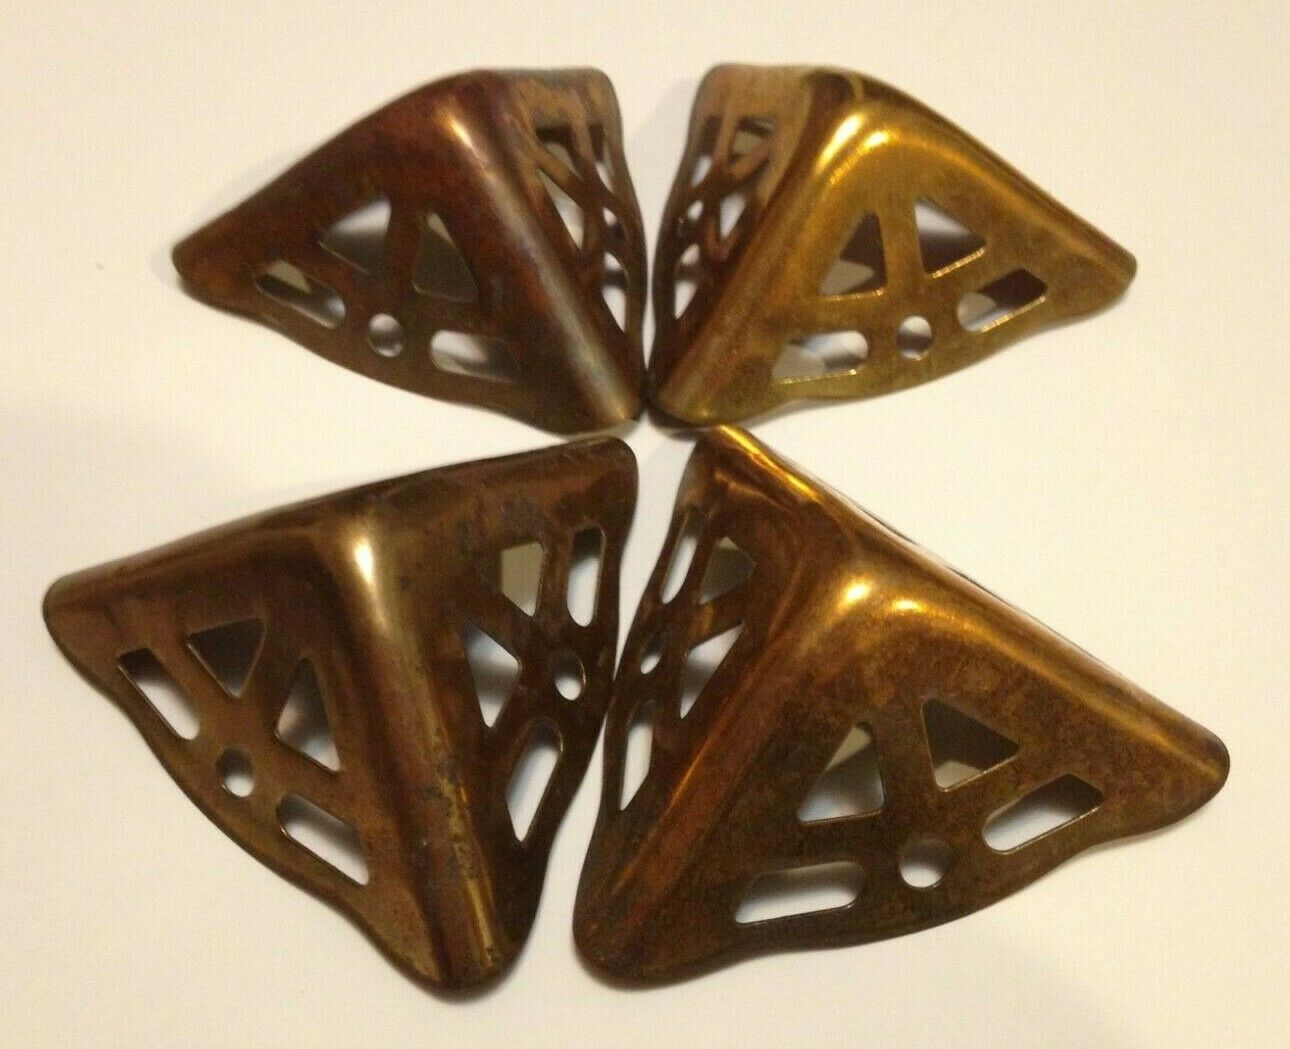 Vintage Corner Protection Pieces For Chest Case Dresser Furniture Art Craft 2x3  - $3.95